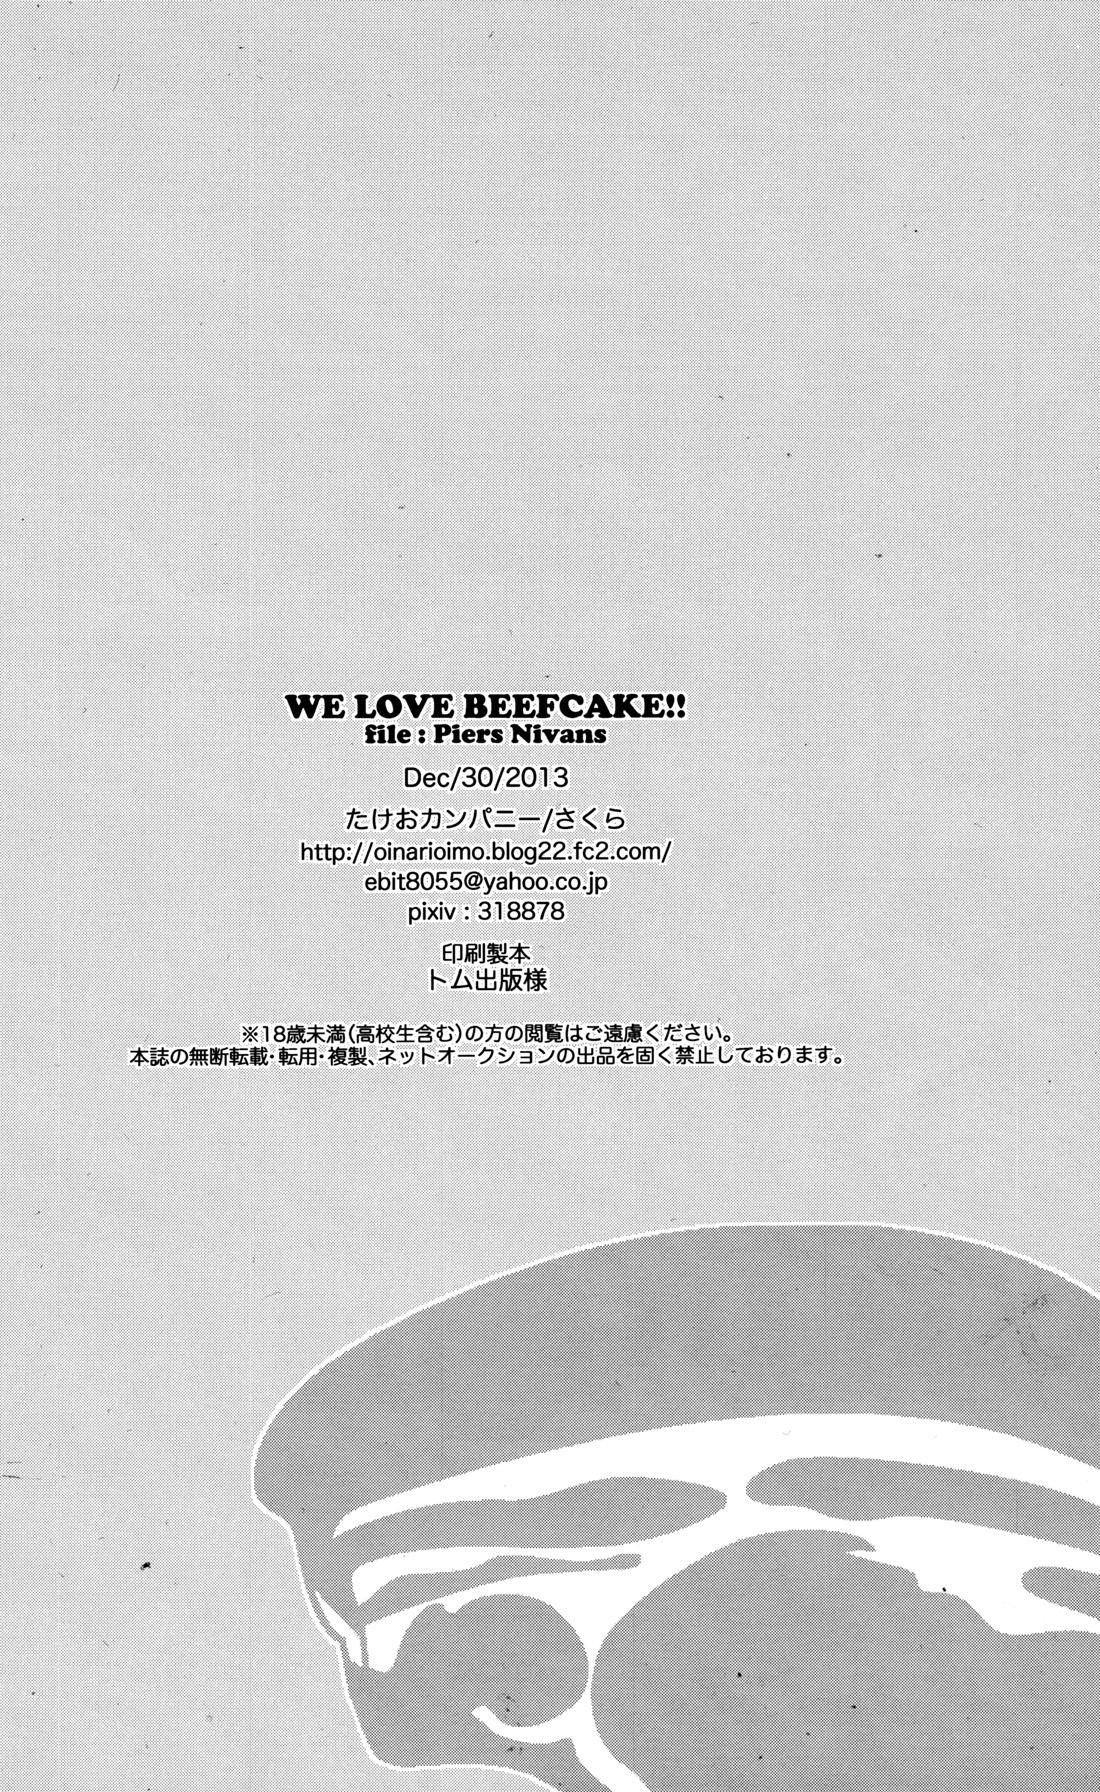 Oinarioimo:We love beefcake 30